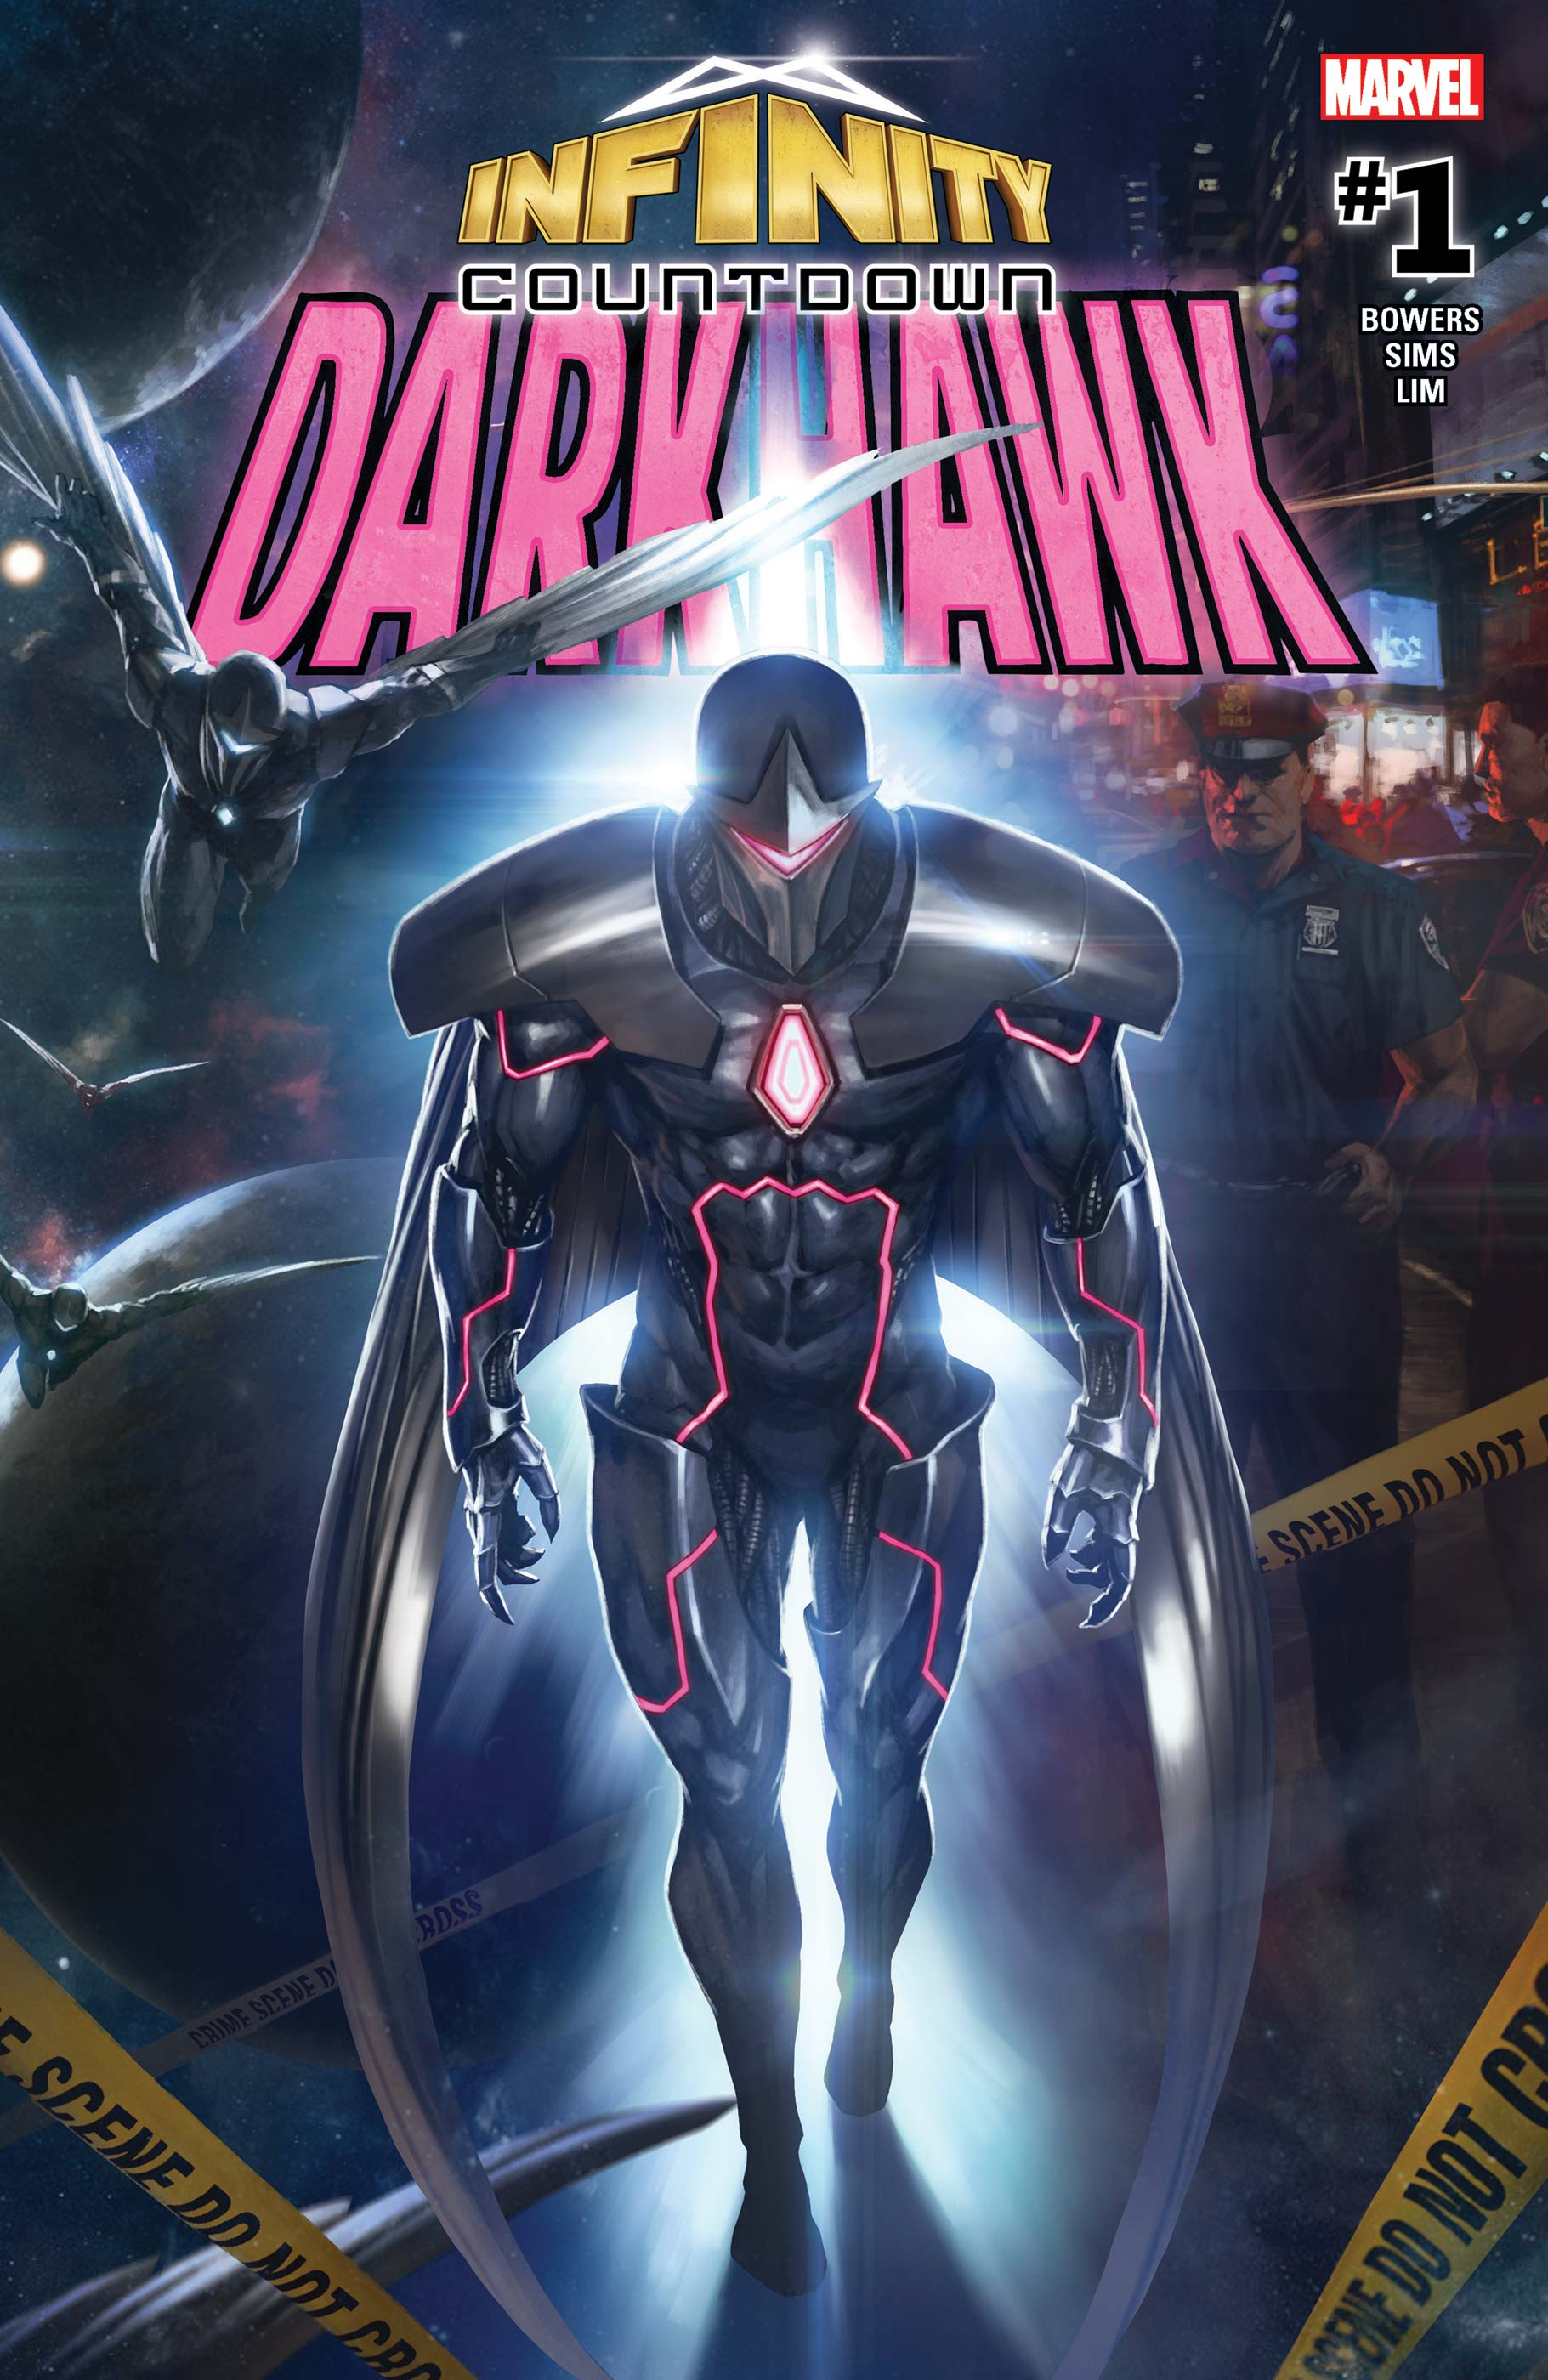 Infinity Countdown: Darkhawk (2018) #1